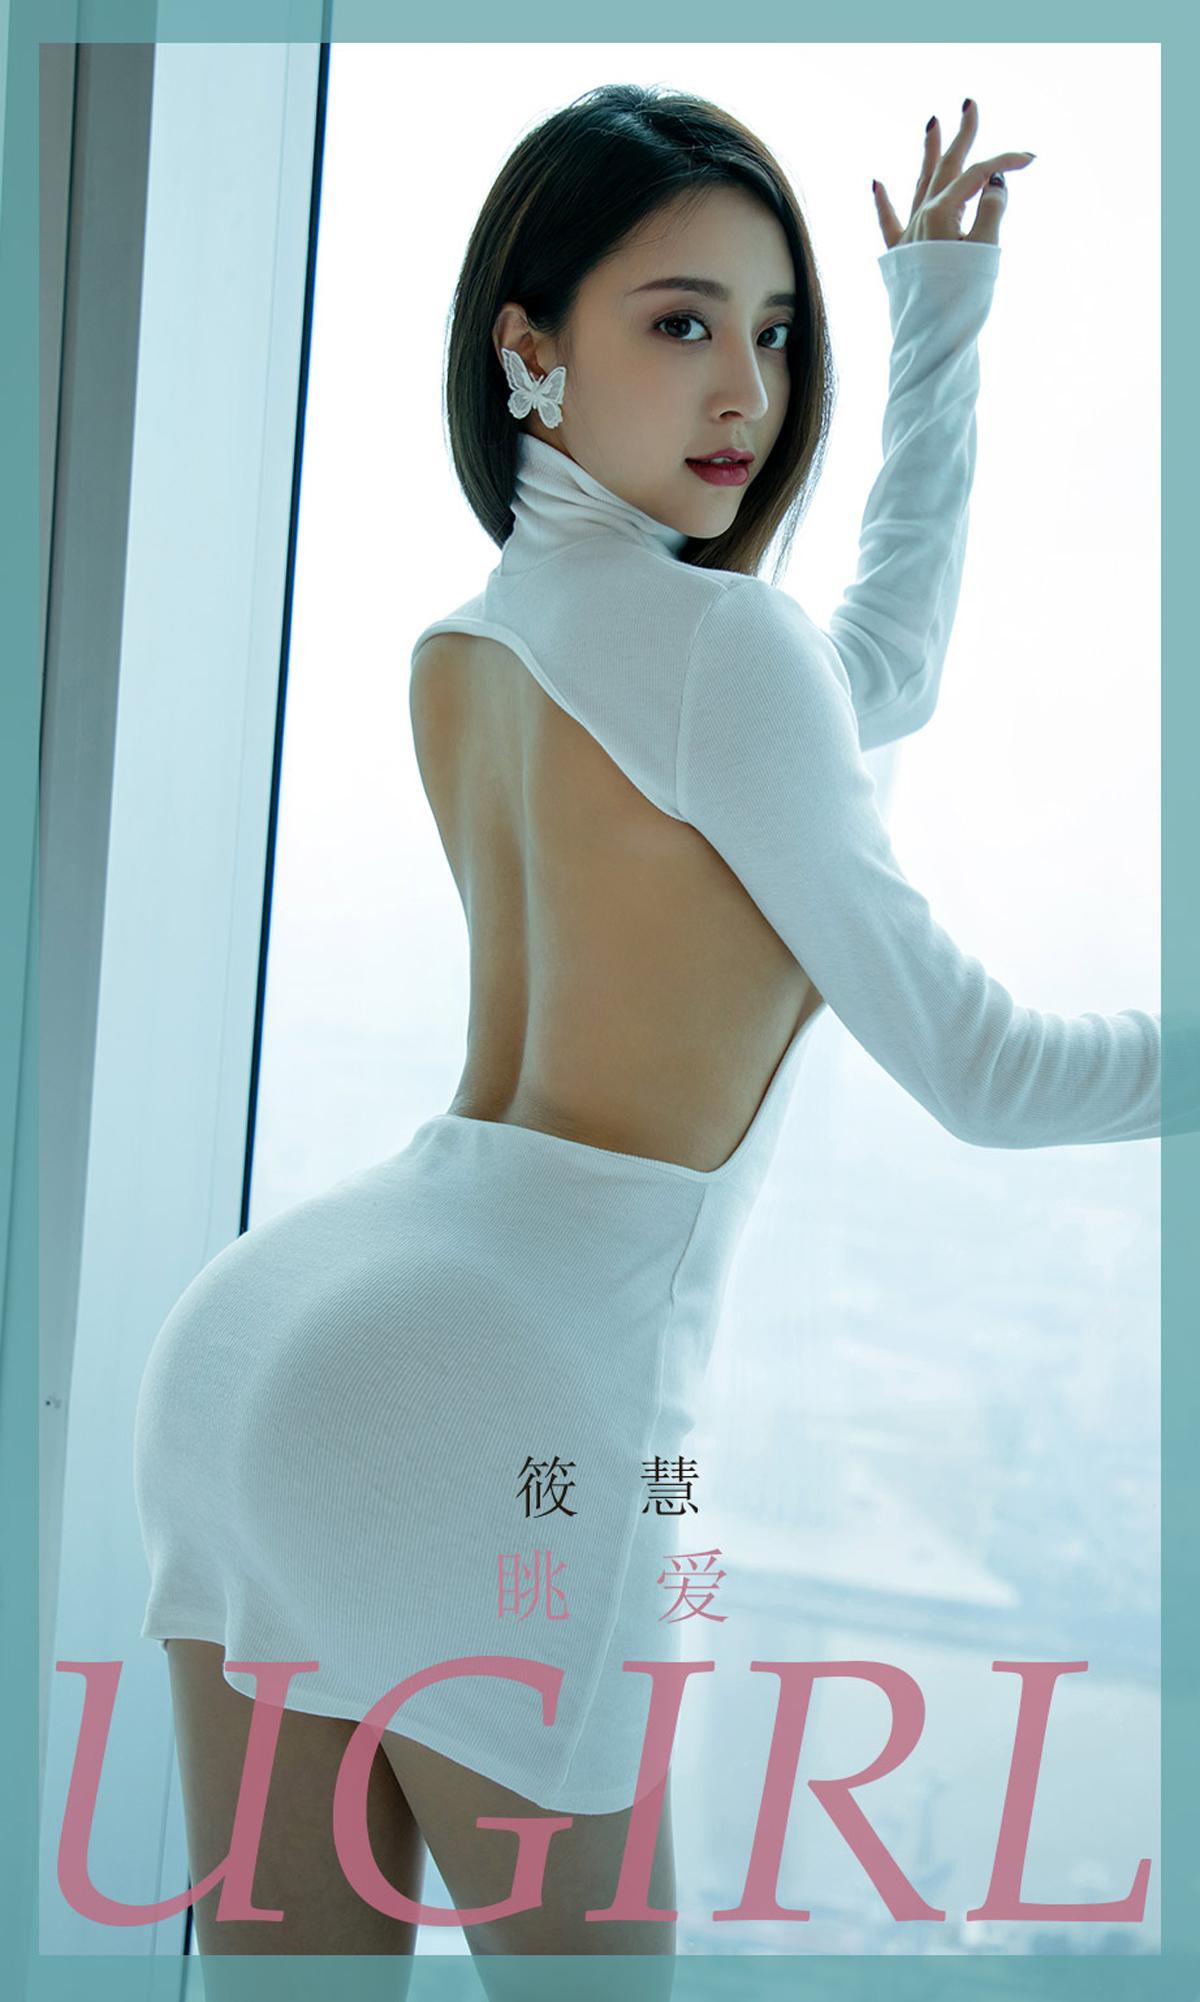 [Ugirls尤果网] 爱尤物专辑 2020.02.13 No.1729 眺爱 筱慧[/31MB]